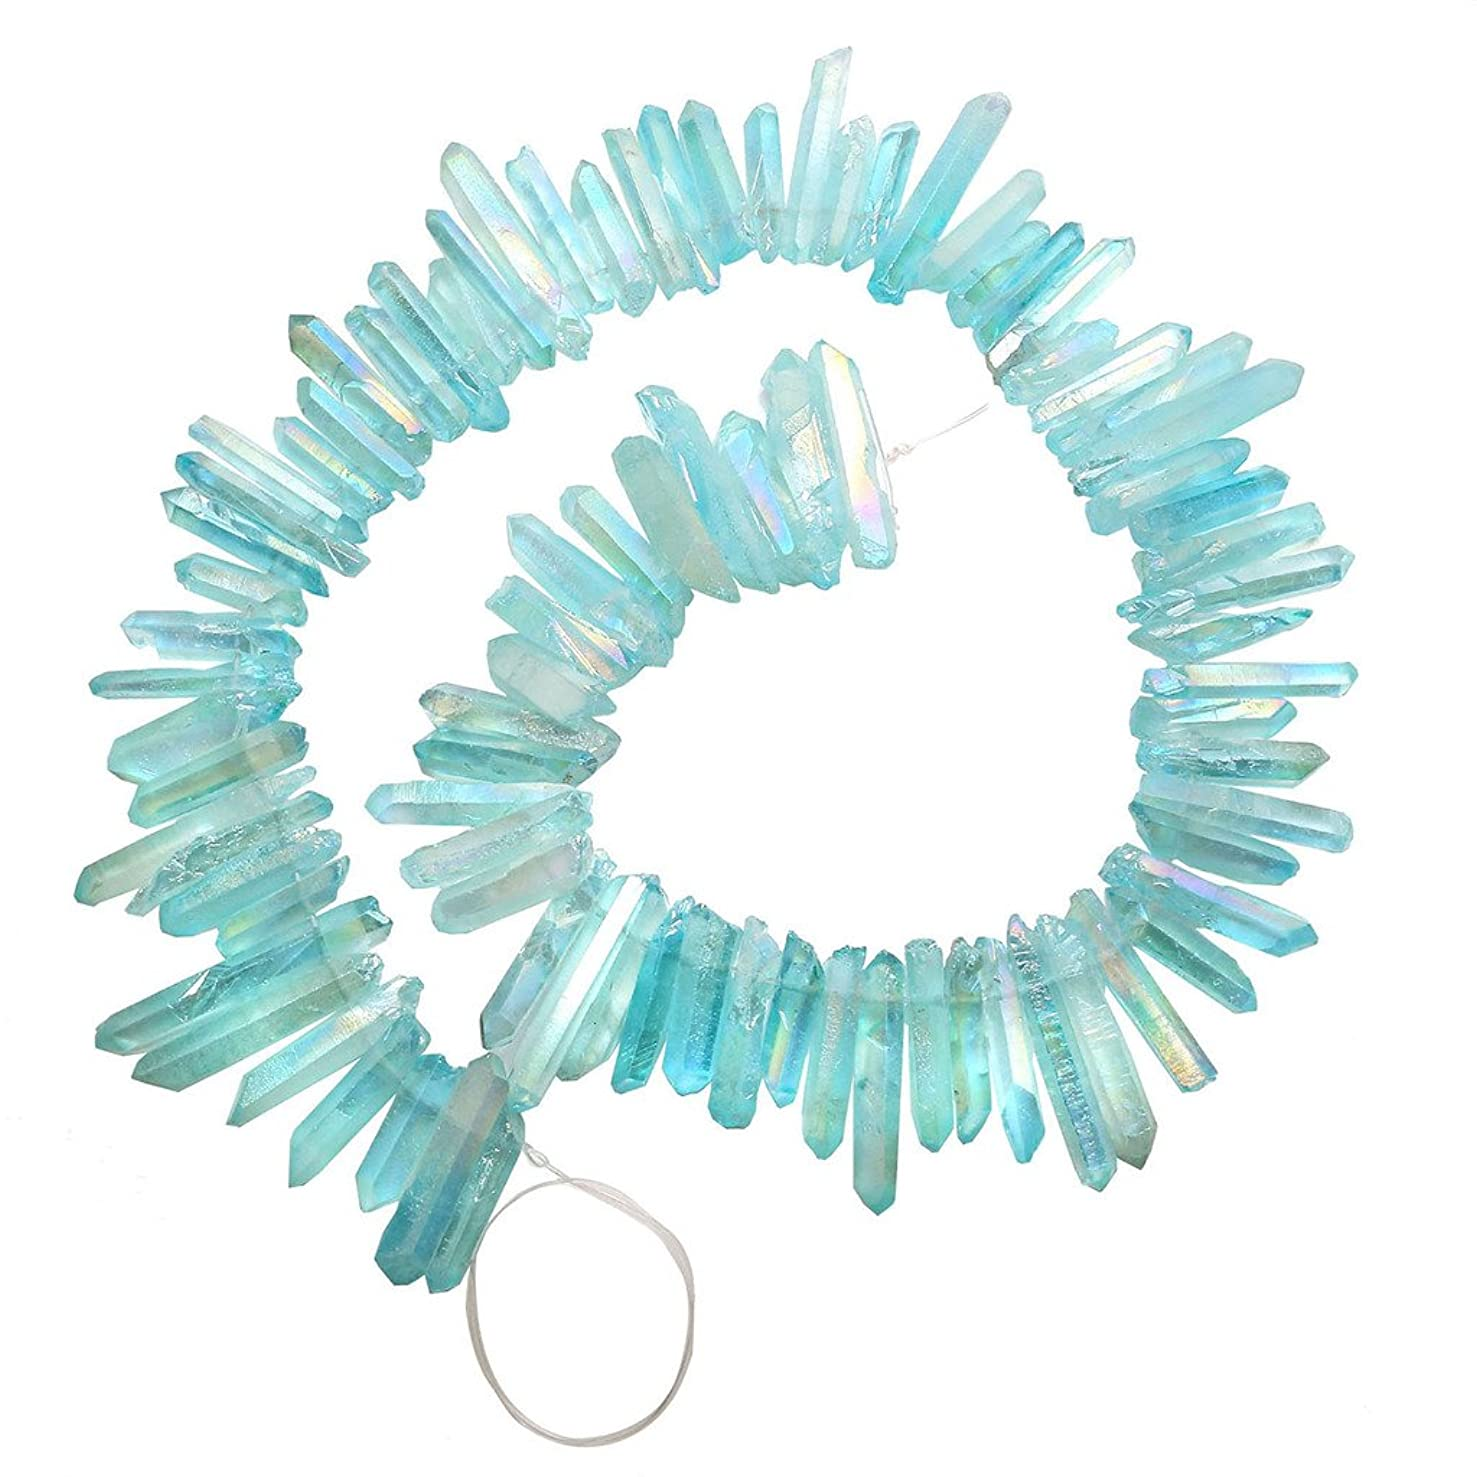 Top Plaza Natural Raw Rock Crystal Quartz Rough Crystals Points Titanium Coated Sticks Spikes Irregular Drilled Loose Beads 15-16'' Strand(Rough AB Color+Aquamarine)